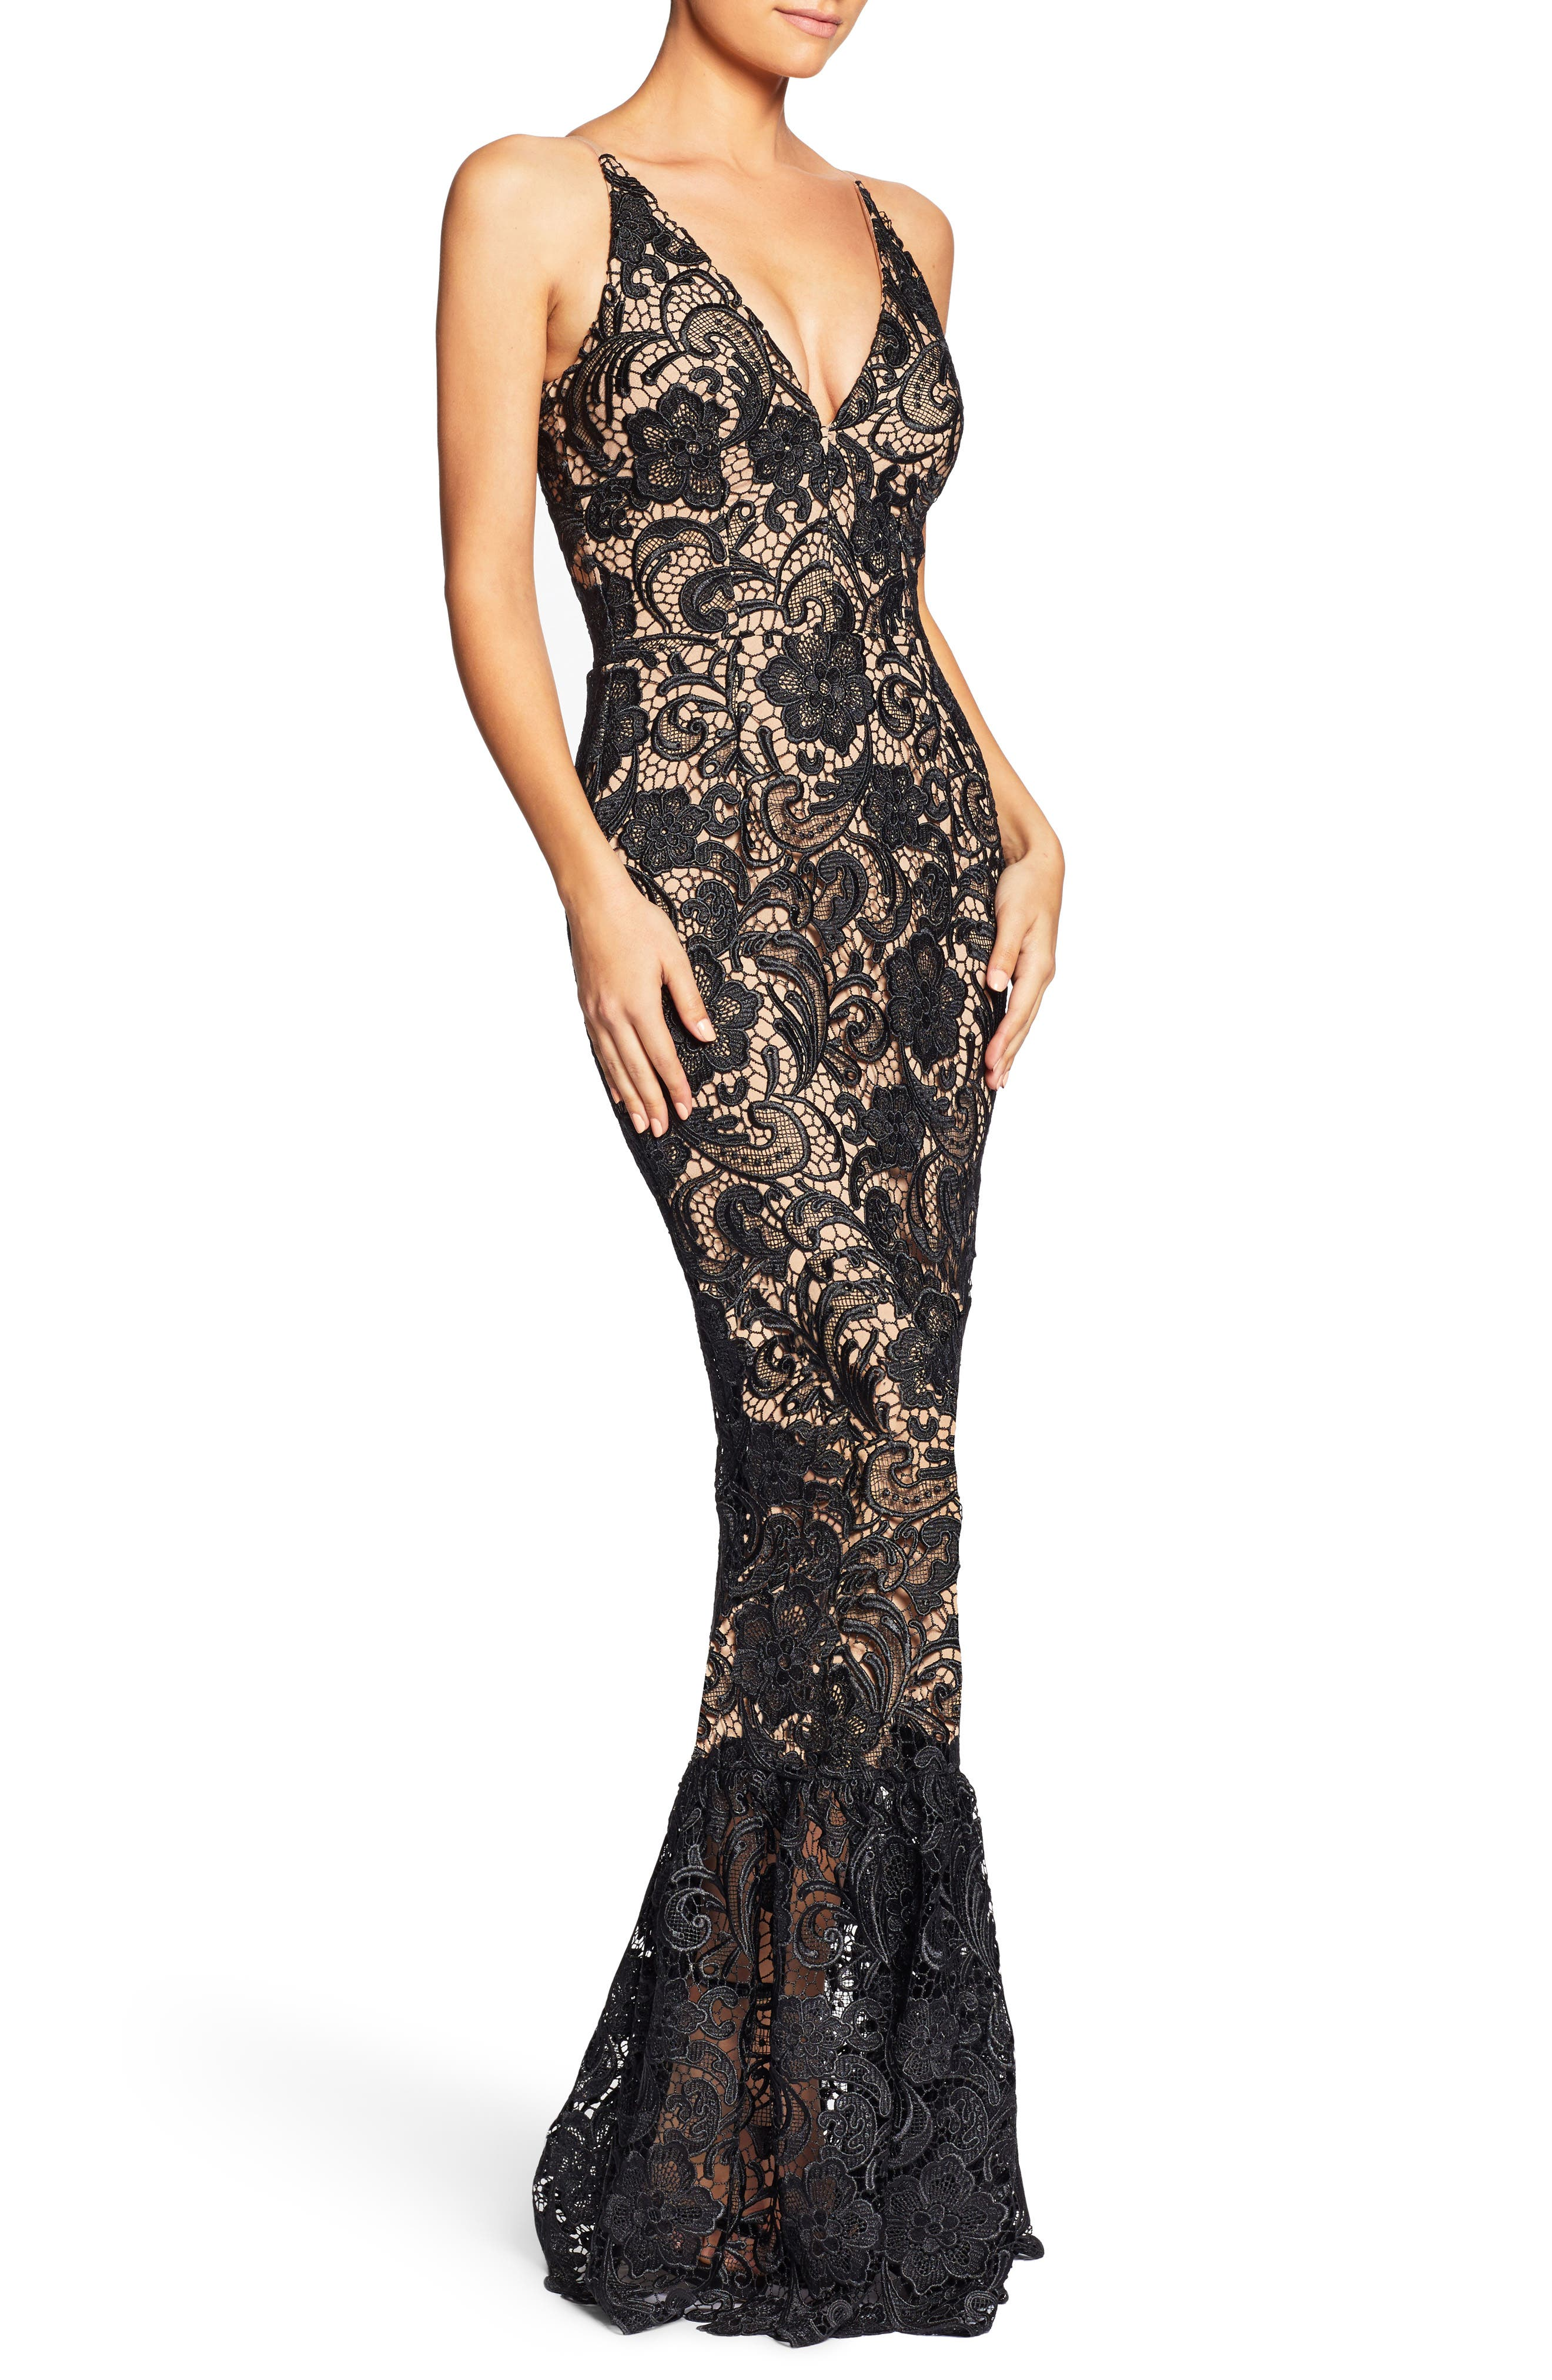 Sophia Crochet Lace Mermaid Gown,                             Alternate thumbnail 3, color,                             Black/ Nude